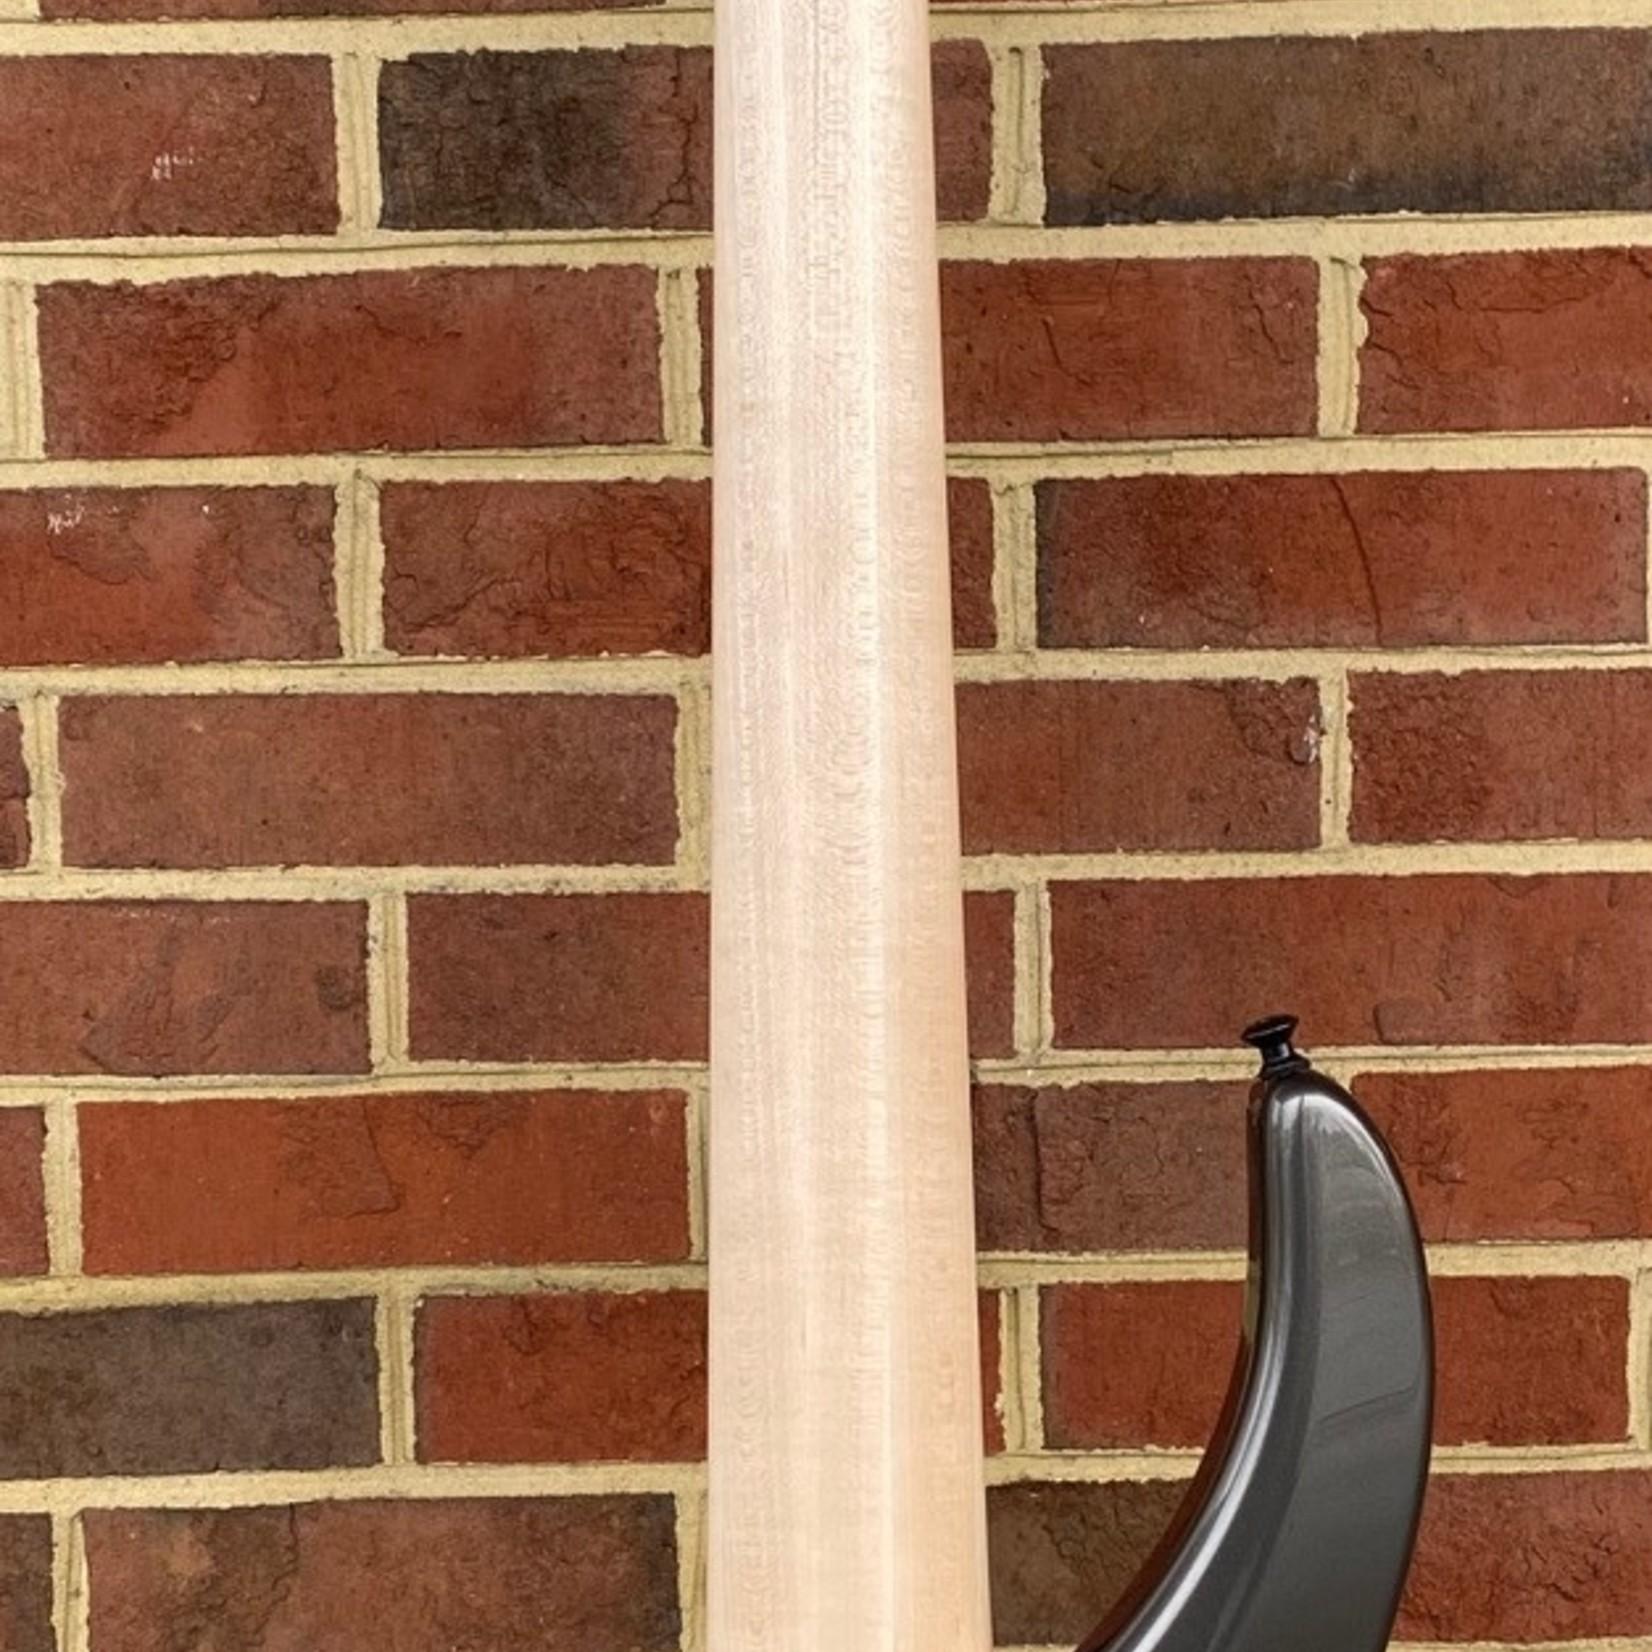 Dingwall Dingwall ABI Custom 5, Afterburner 5-String, 3x Pickups, Alder Body, Charcoal Metallic Custom Color, Maple Neck, Wenge Fretboard, Speedo Bar Inlays, Blue Luminlay Side Markers, Darkglass Tone Capsule Preamp, Dingwall Deluxe Gig Bag